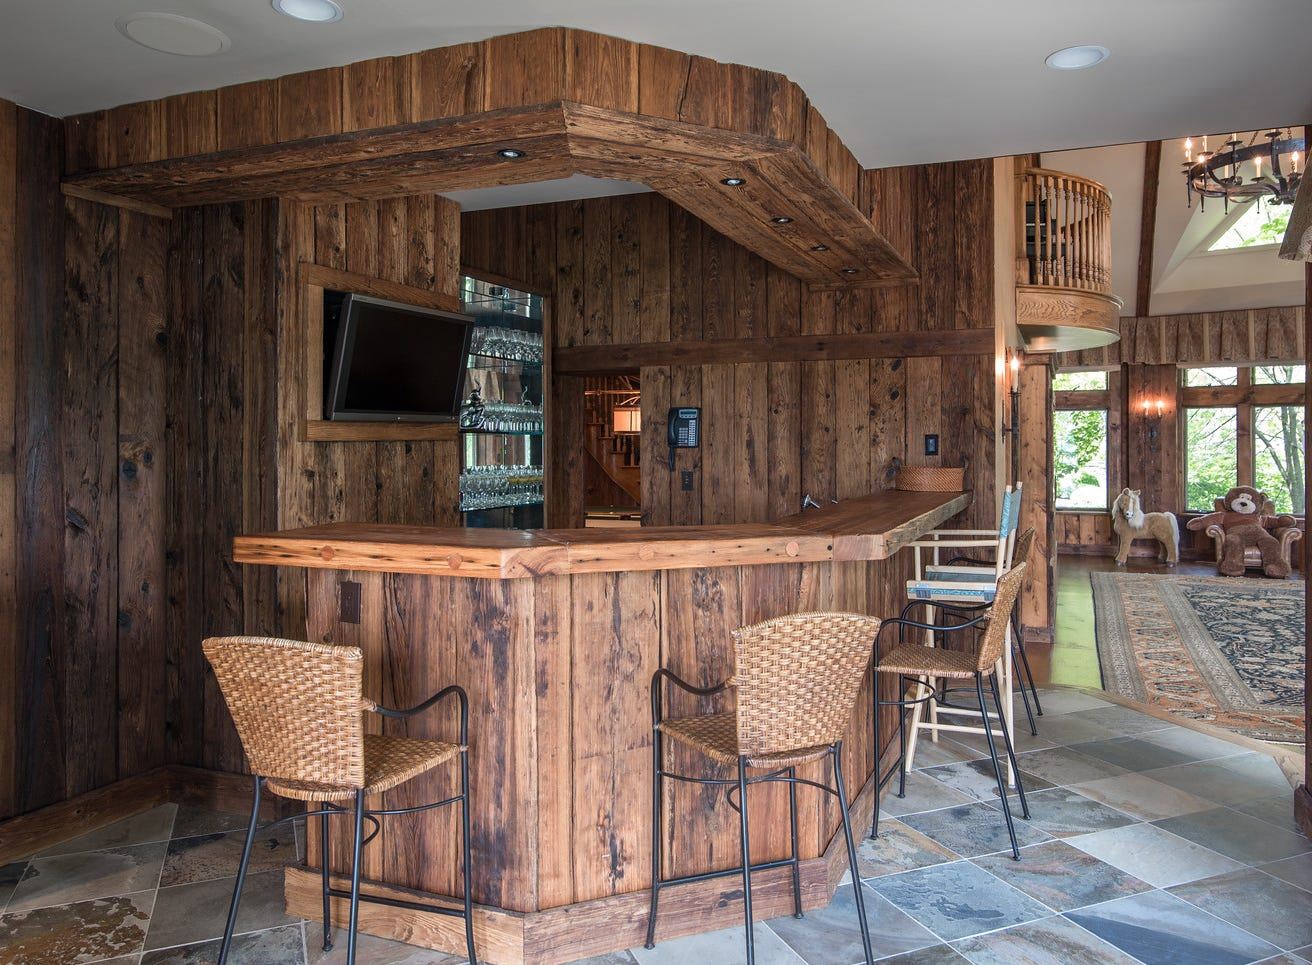 Derek Jeter's Tiedeman Castle on Orange County's Greenwood Lake is for sale.